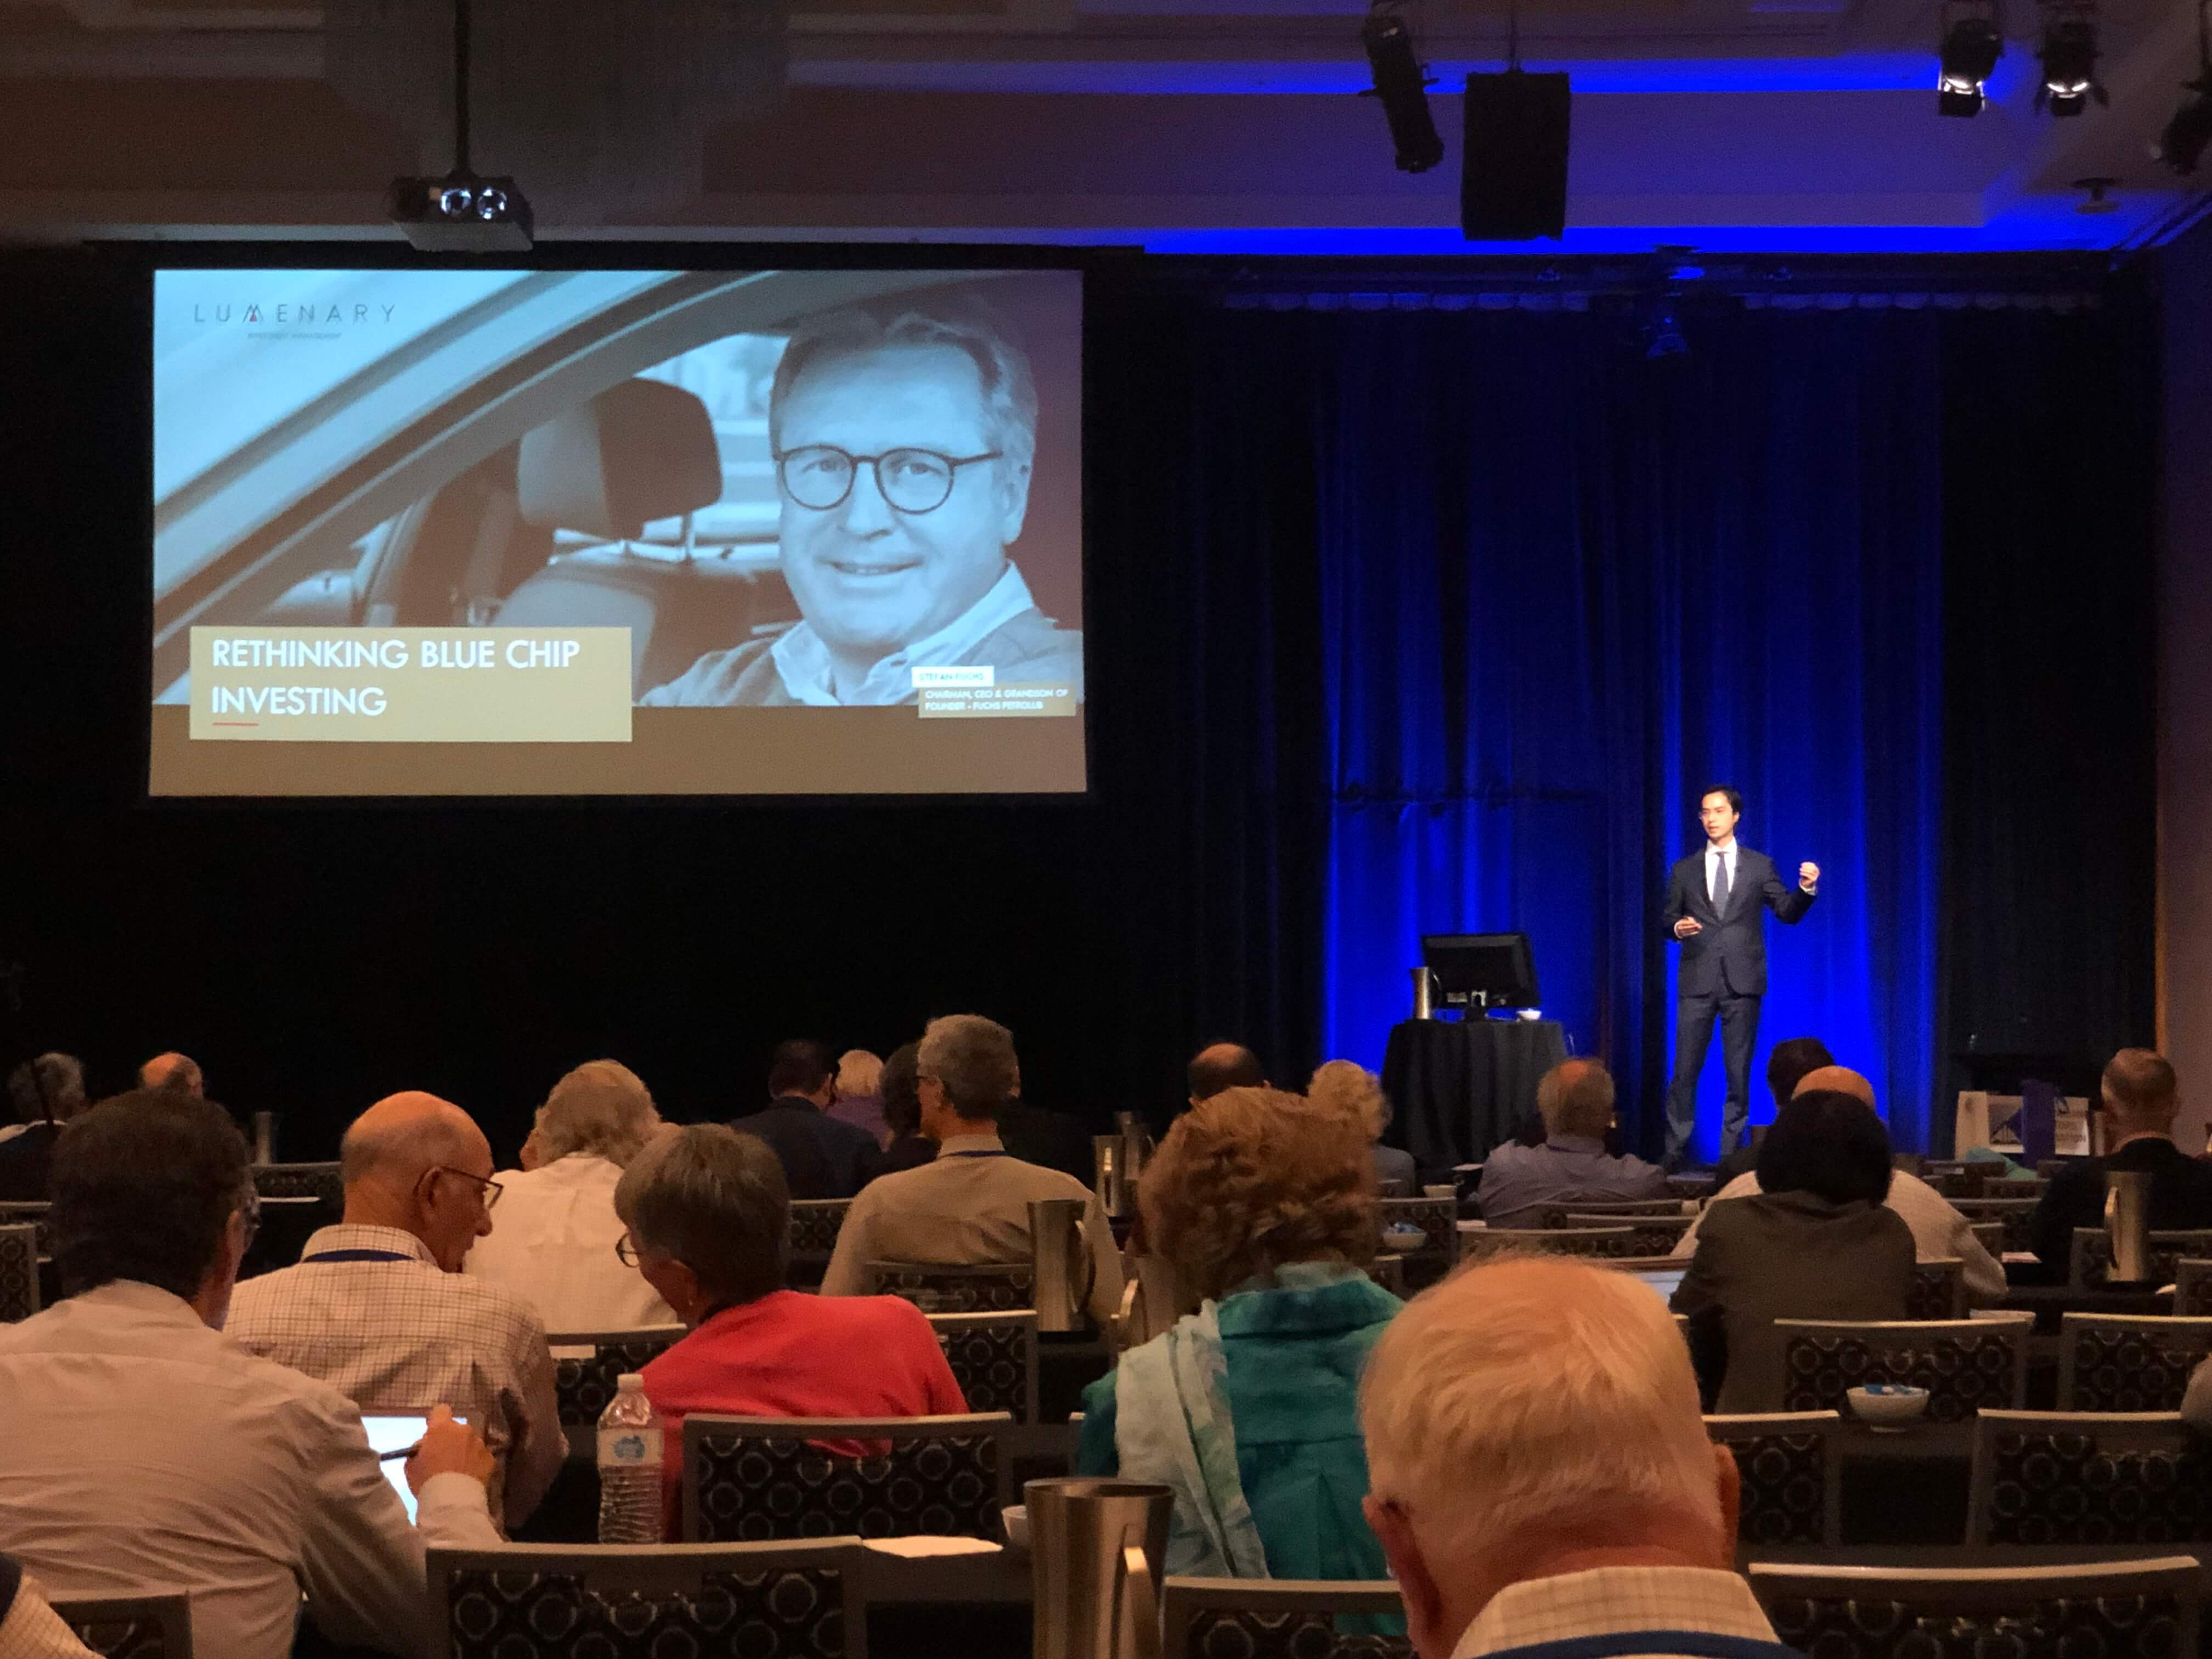 Rethinking Blue Chip Investing presentation cover